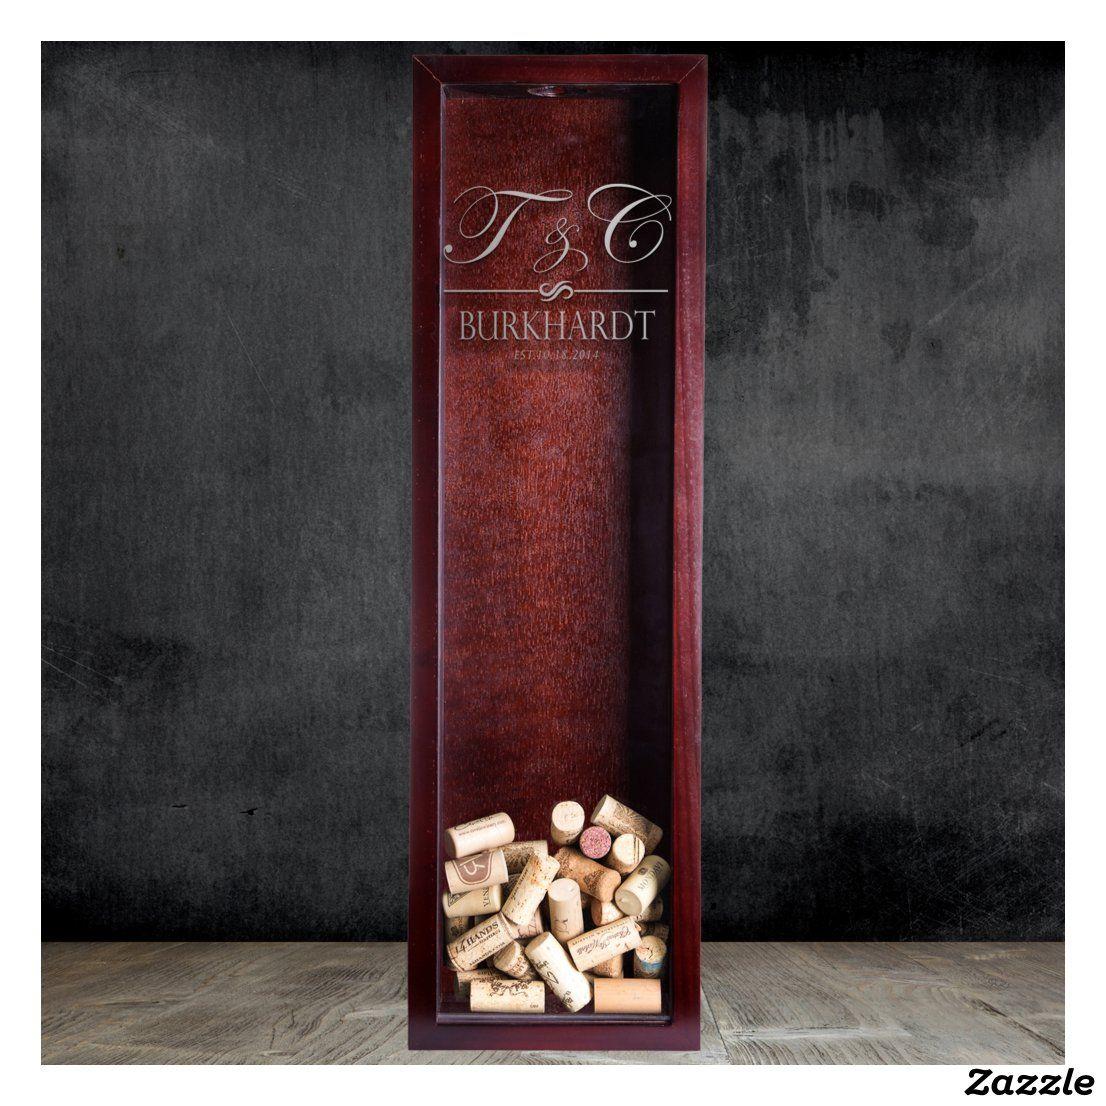 Initial Monogrammed Wine Cork Holder Shadow Box Zazzle Com In 2020 Wine Cork Holder Cork Holder Wine Cork